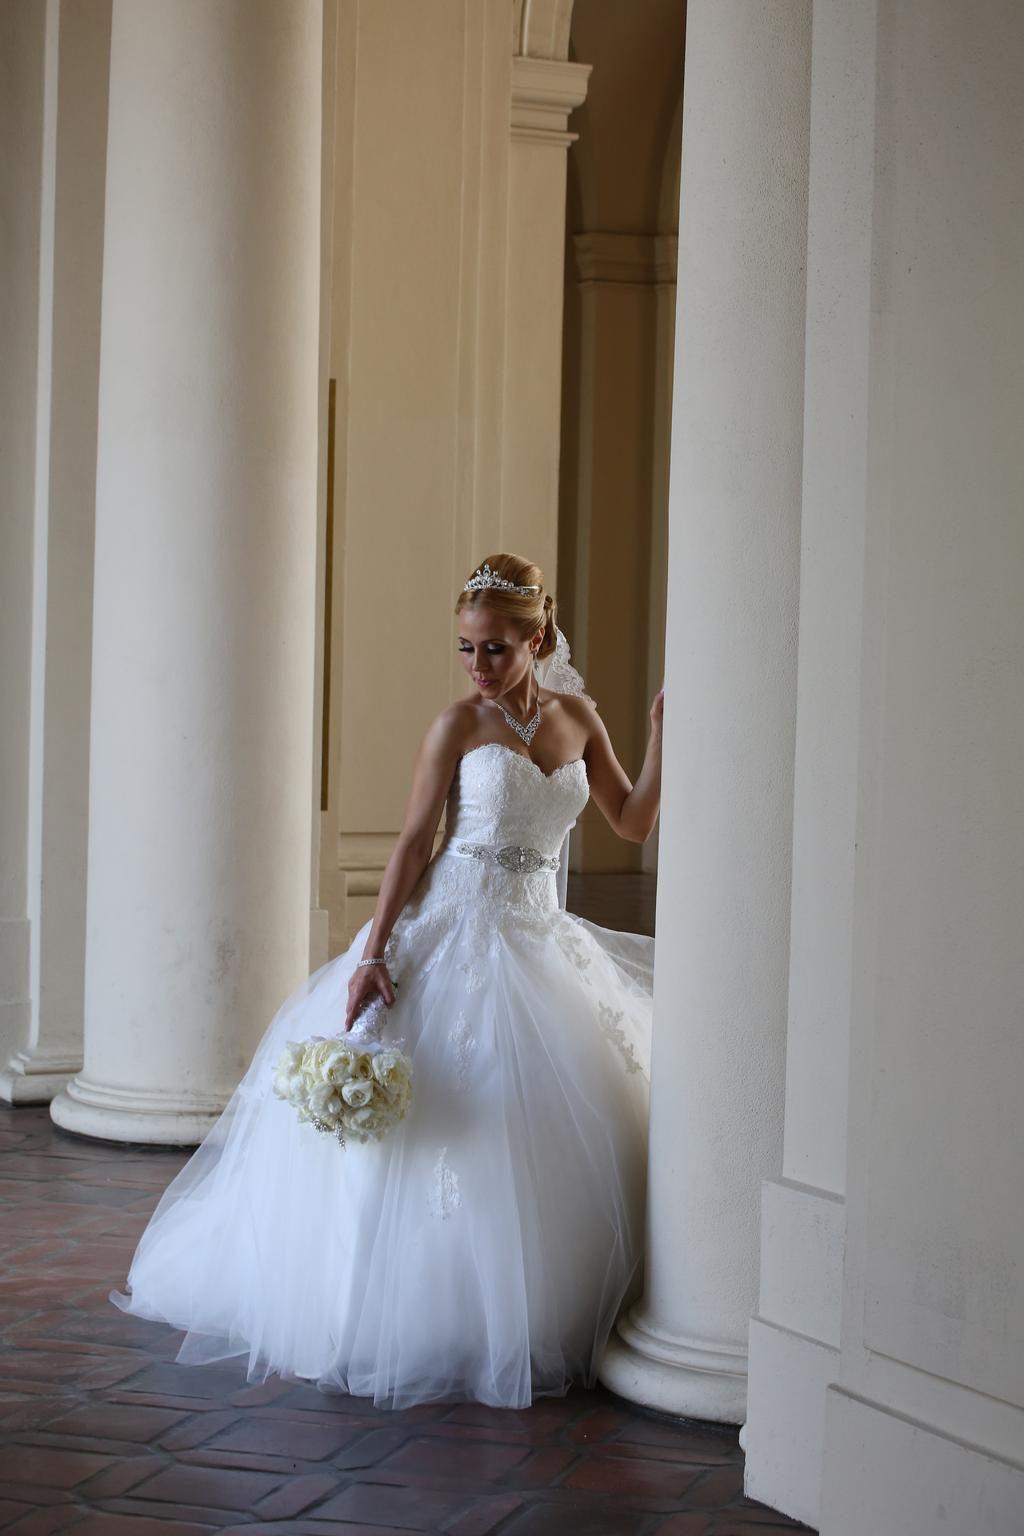 Pre owned wedding dresses  Davidus Bridal  Size   New UnAltered Wedding Dresses